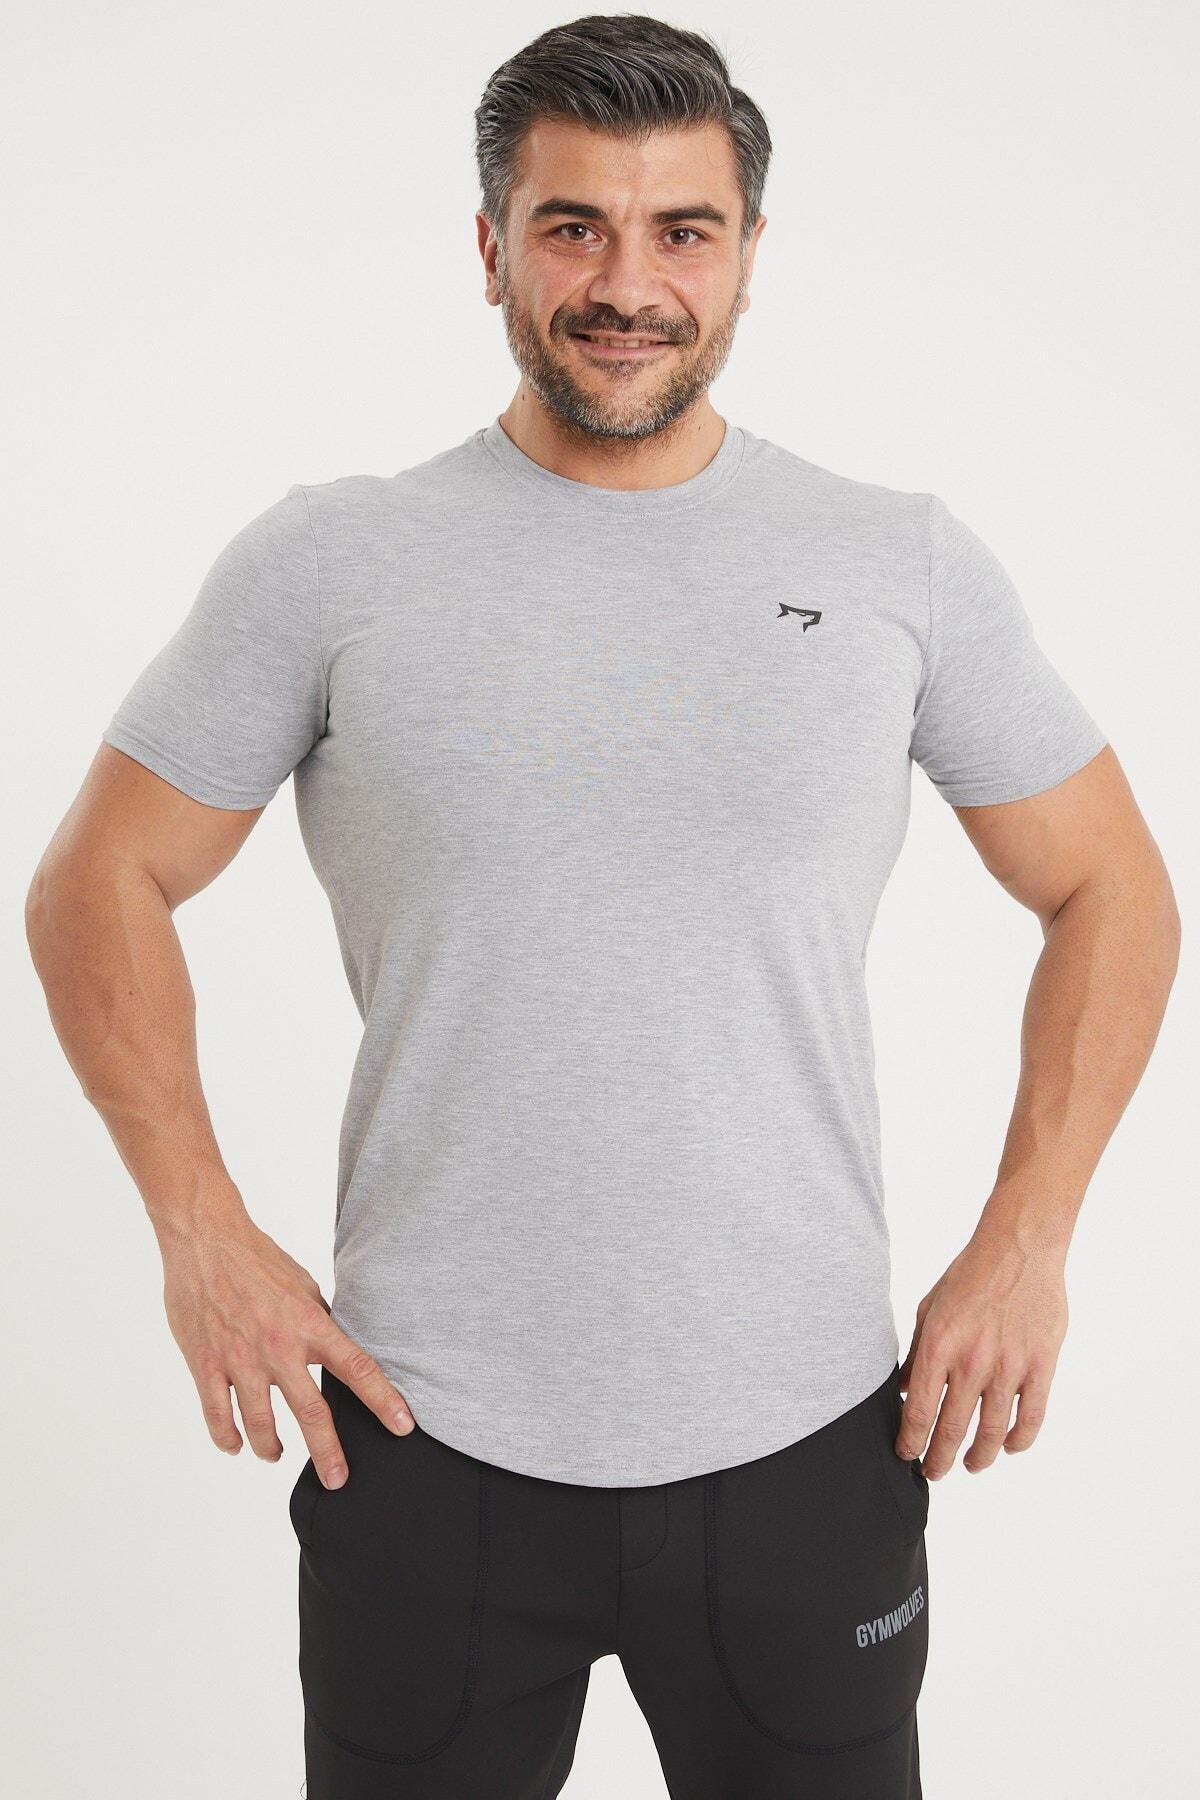 Gymwolves Spor Erkek T-shirt   Gri   T-shirt   Workout Tanktop   1